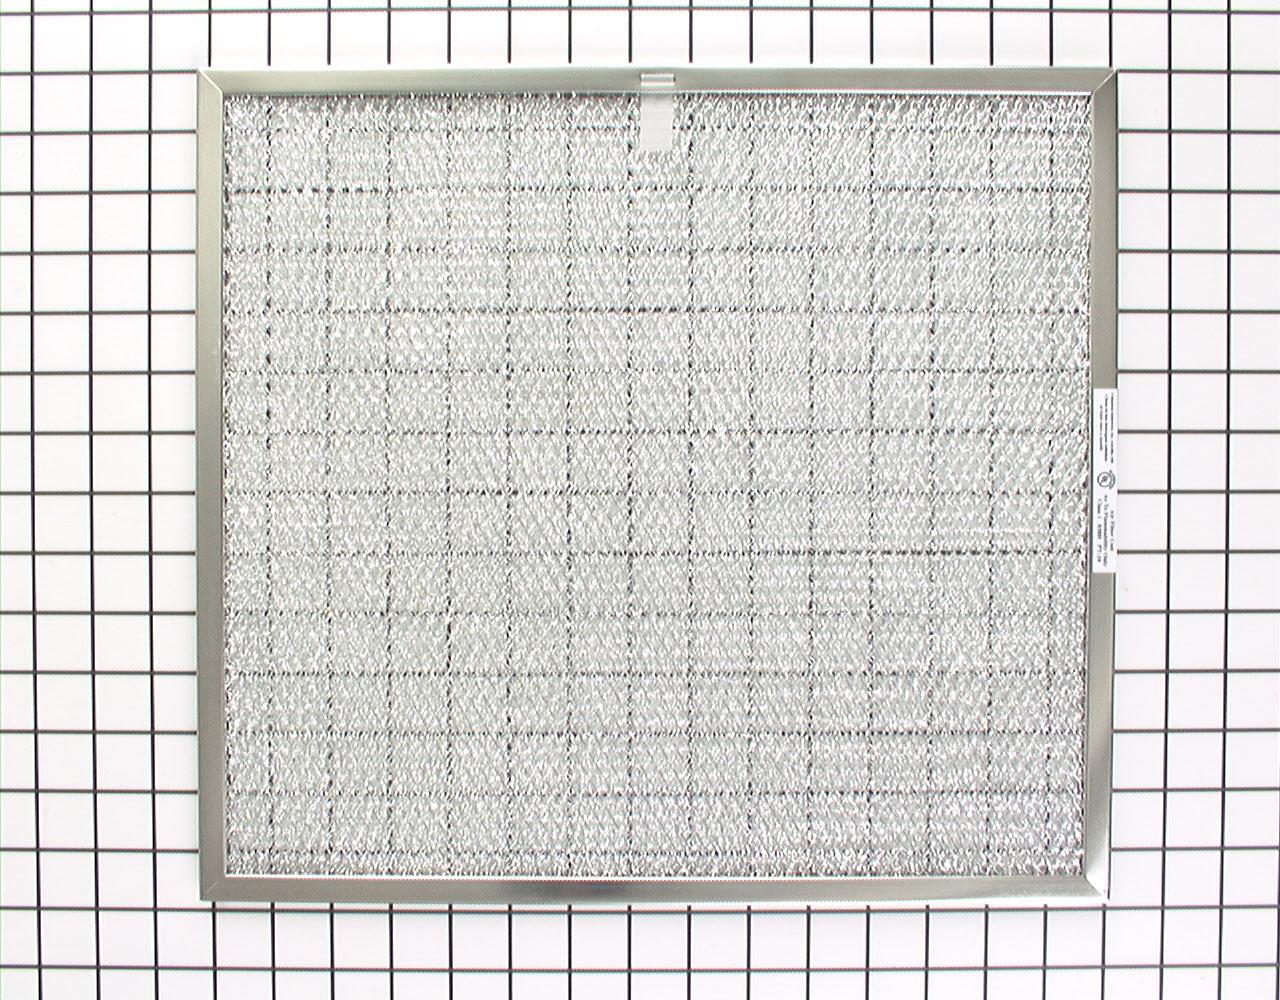 Range Vent Hood Part #  - Grease Filter - Broan S99010250